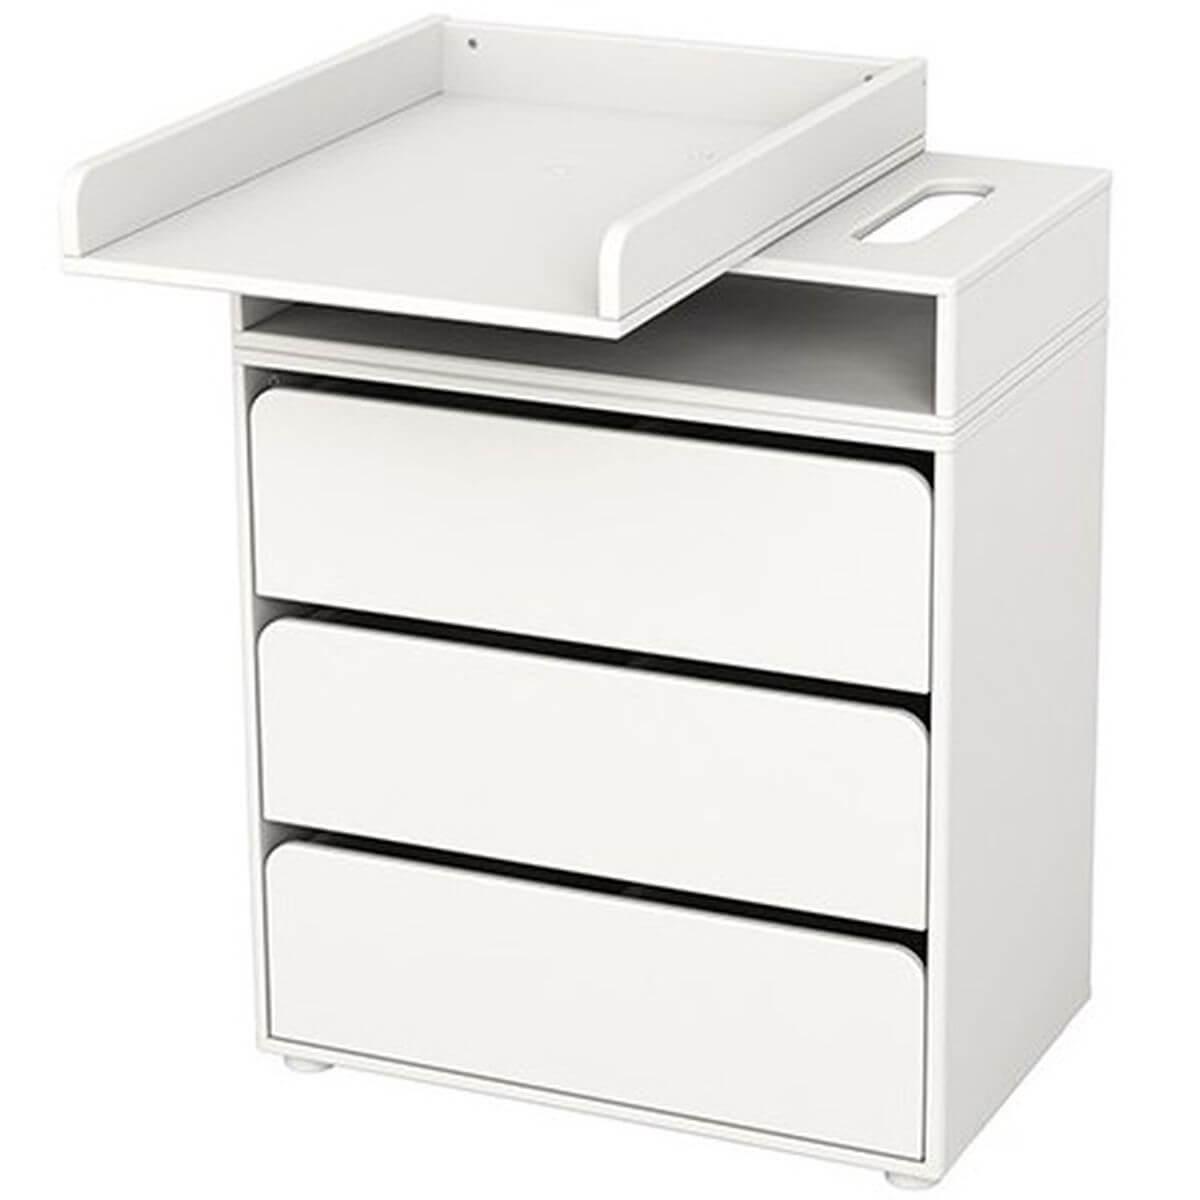 CABBY by Flexa Commode à langer 3 tiroirs Blanc